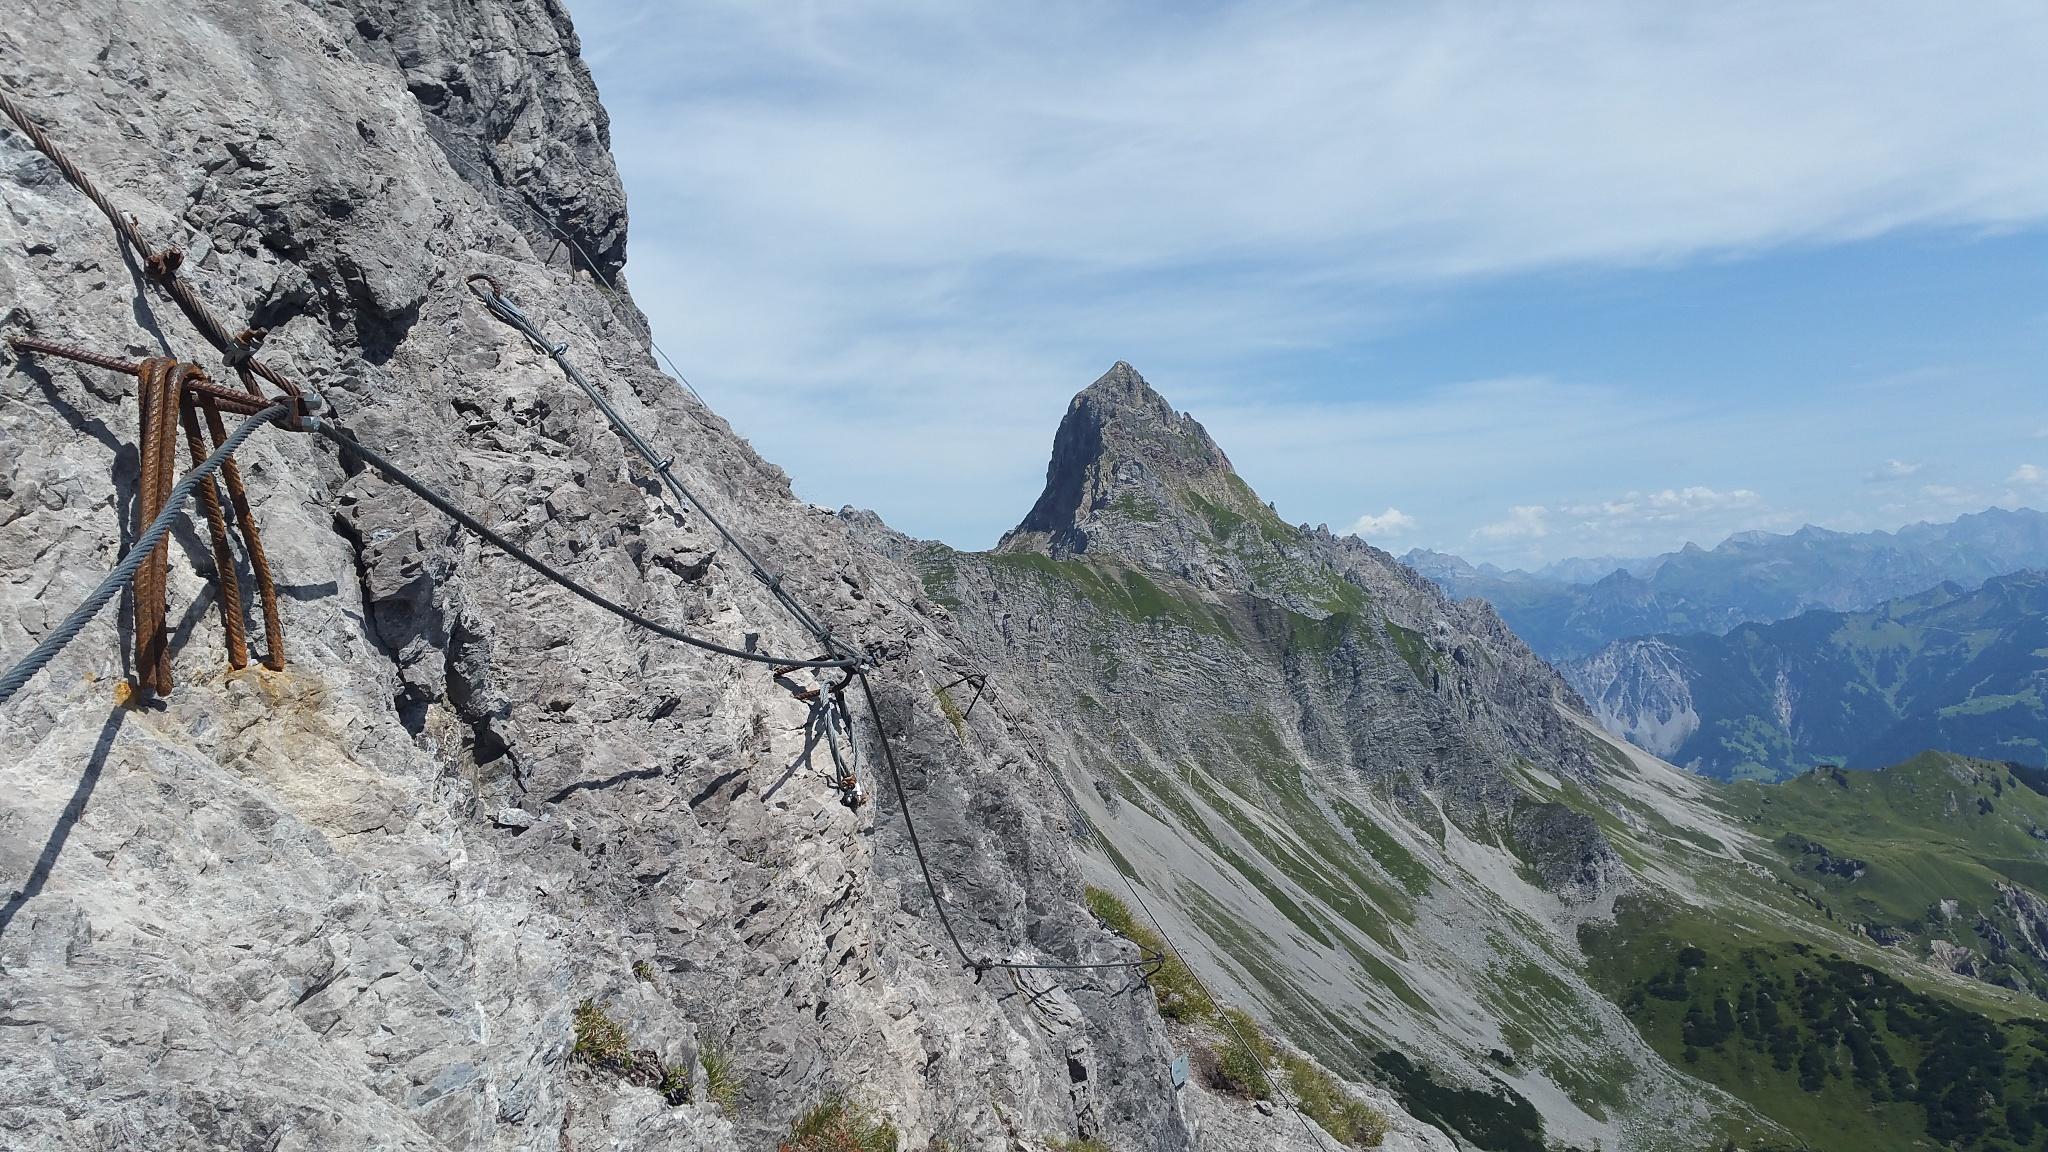 Klettersteig Saulakopf : Klettersteig saulakopf Österreichs wanderdörfer